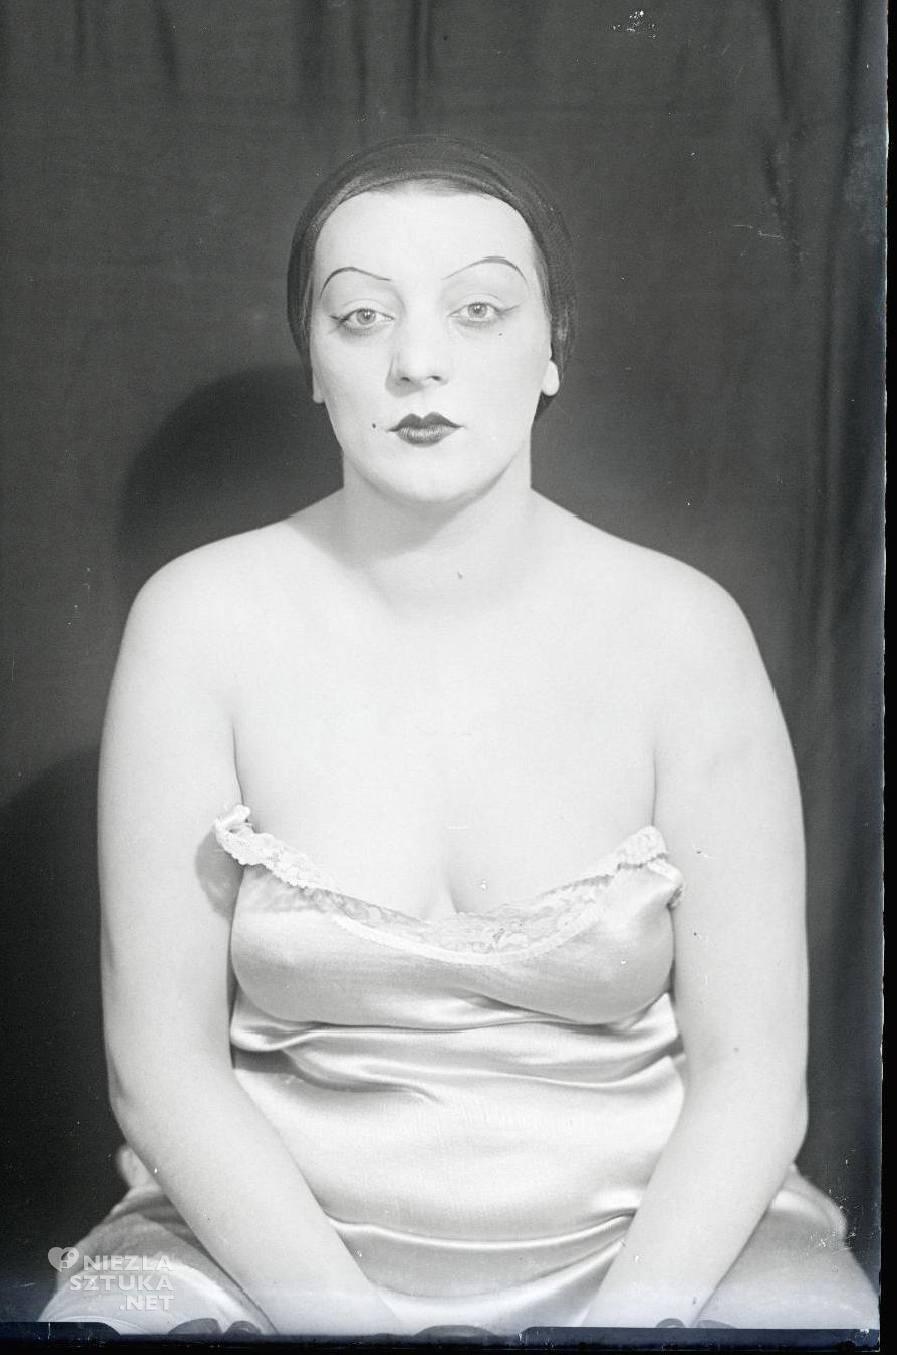 Guy Carrard Alice Prin (Kiki de Montparnasse), 1930, © Man Ray Trust / Adagp, Paris, www.centrepompidou.fr